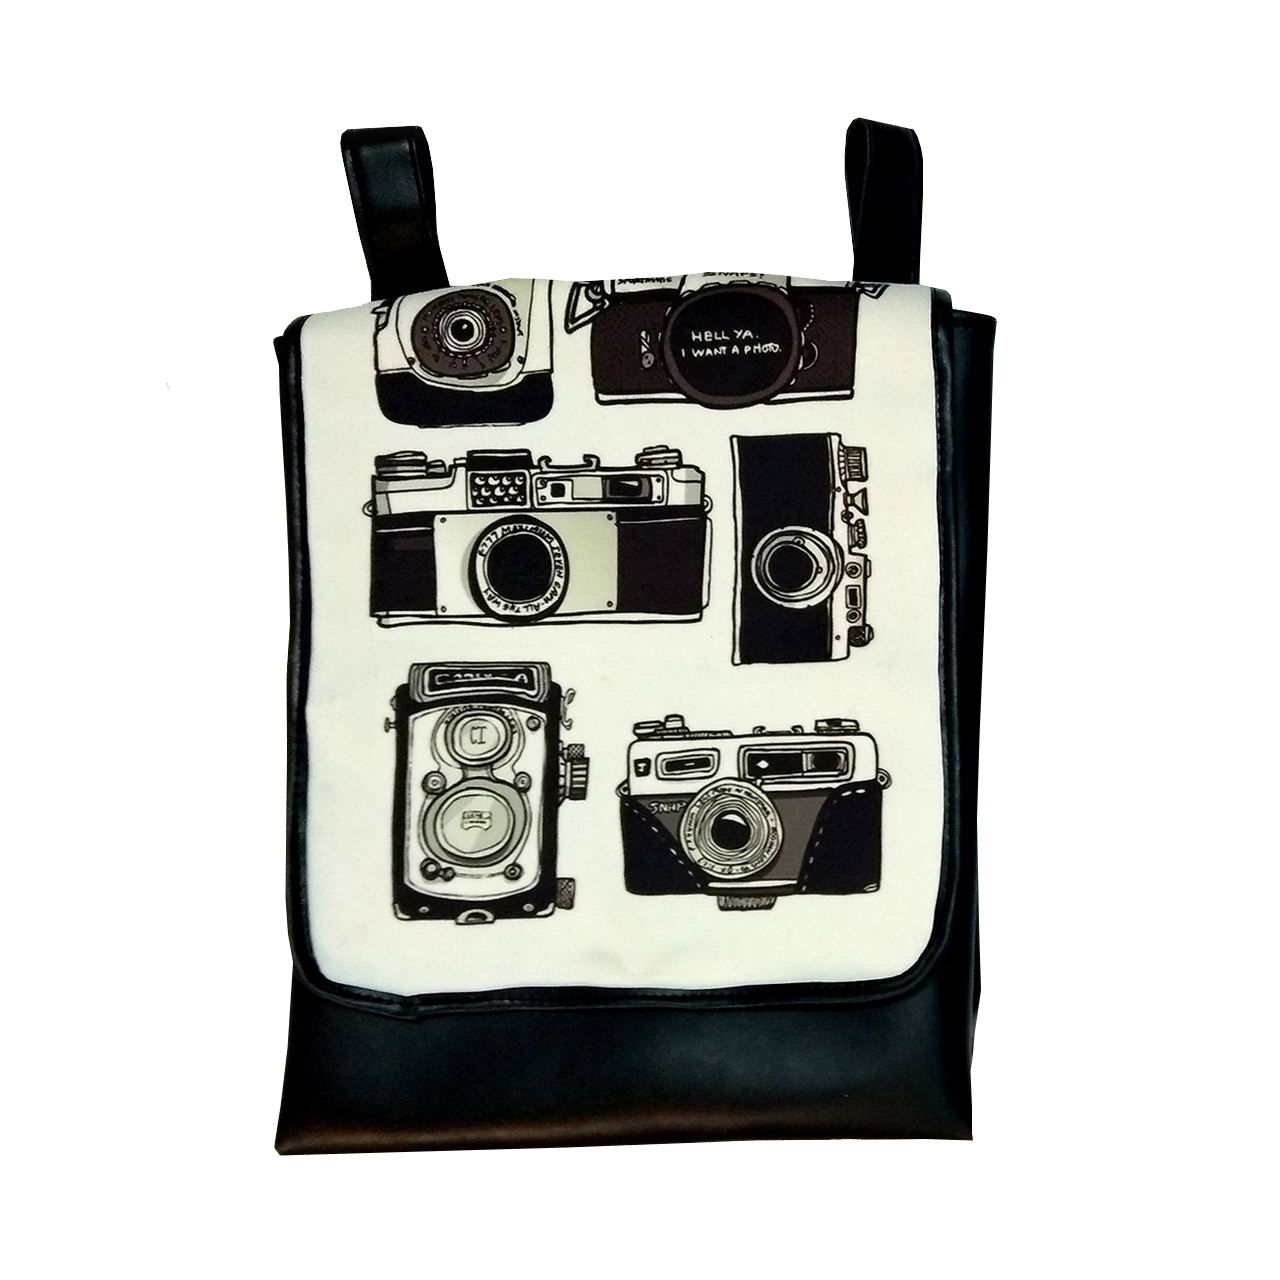 کوله پشتی دالاوین طرح دوربین کد K-6 -  - 2